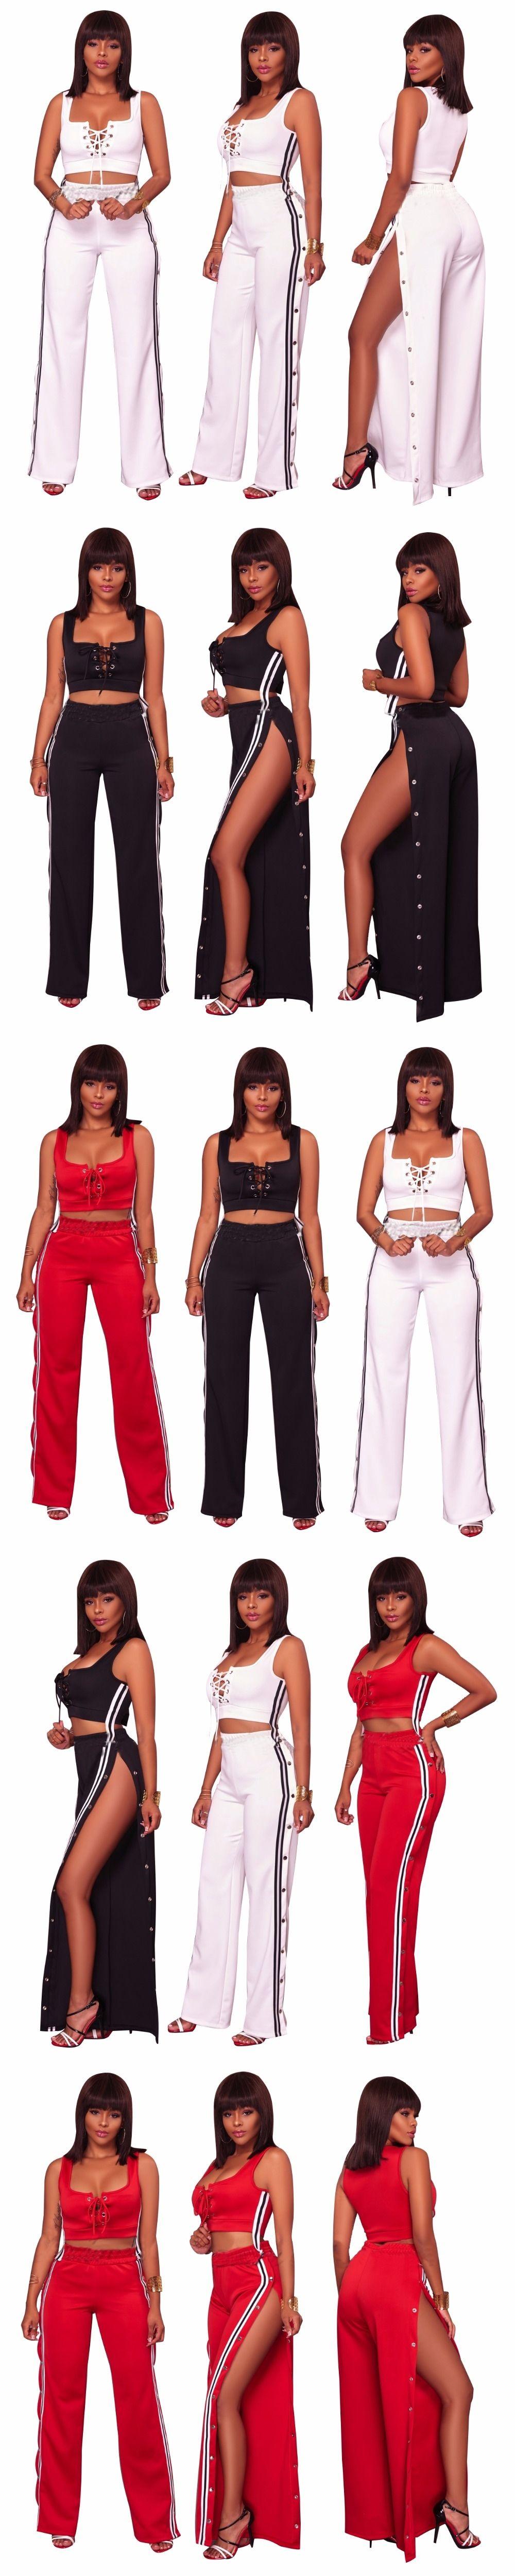 62b66f4ce89a 2018 Summer Fashion Women Sexy clothes Plus size two piece set crop top  Cropped Tops split Pants Hot Sale suit tracksuit